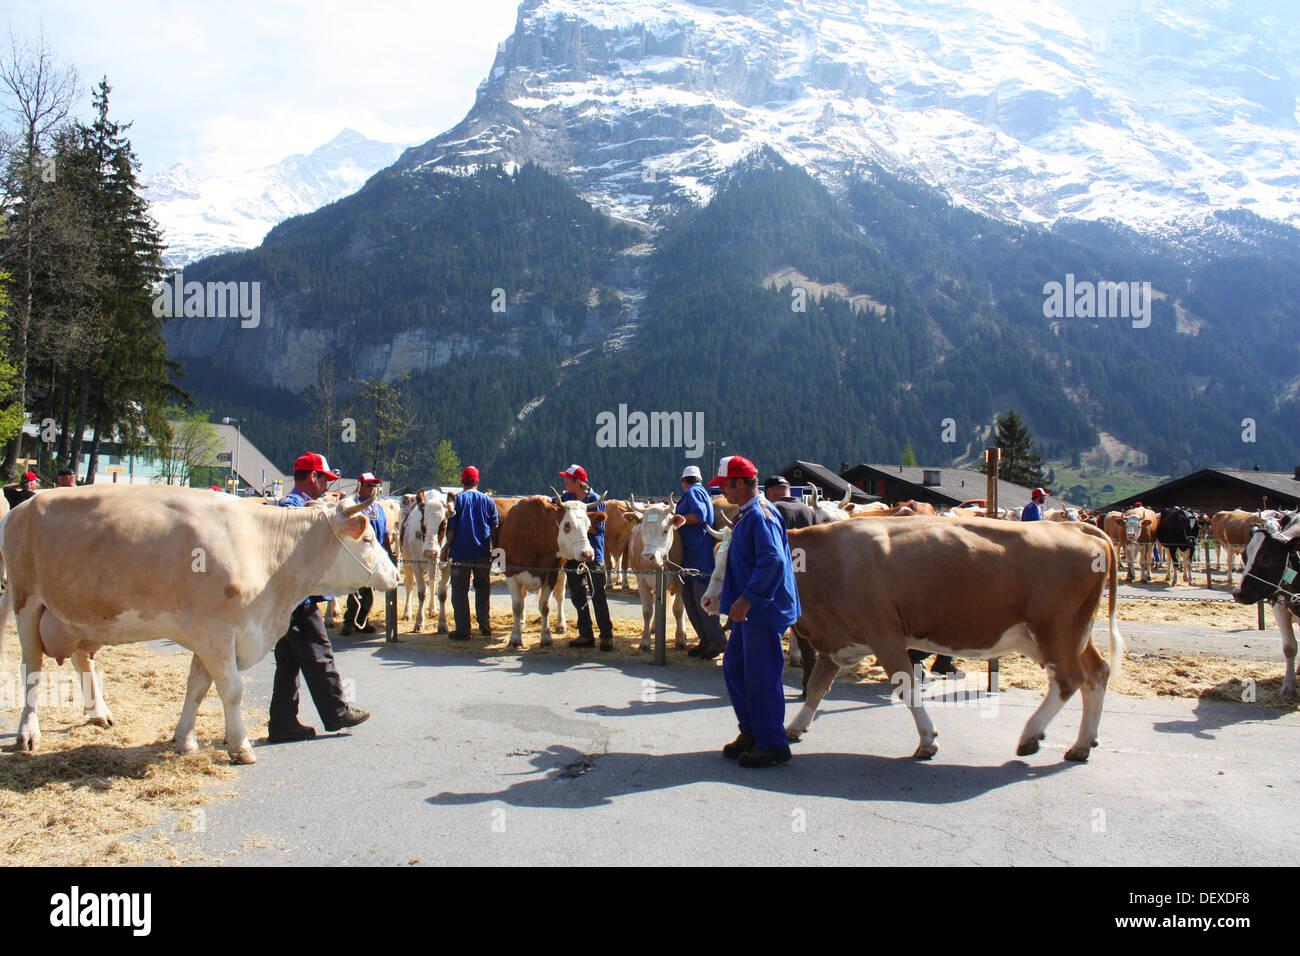 Cows show in Grindelwald, Switzerland Stock Photo